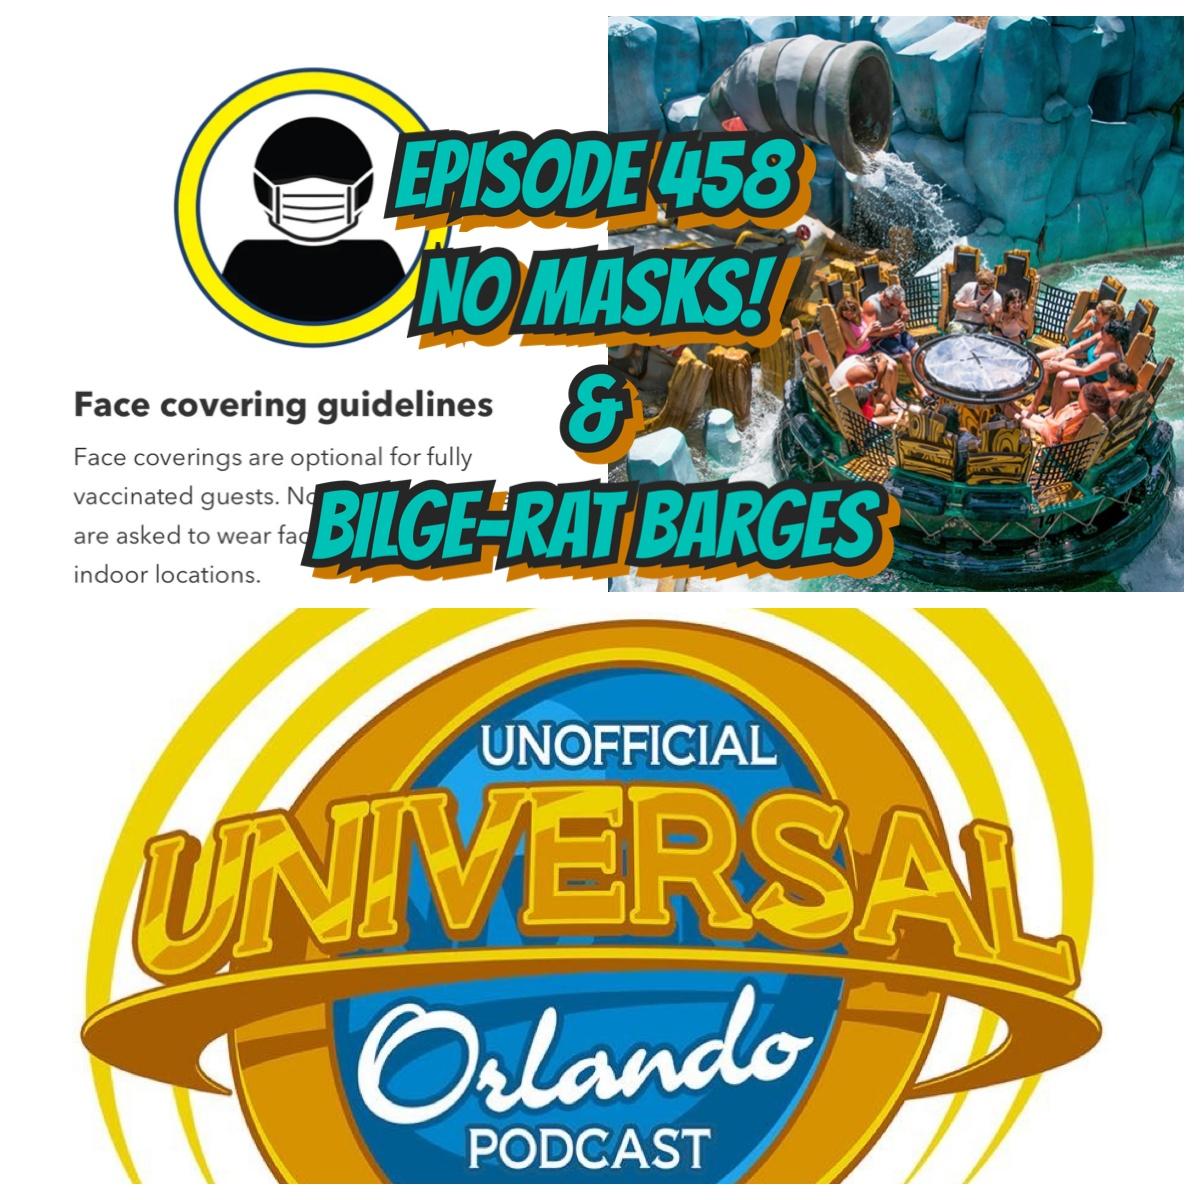 UUOP #458 - No Masks! & Bilge-Rat Barges show art